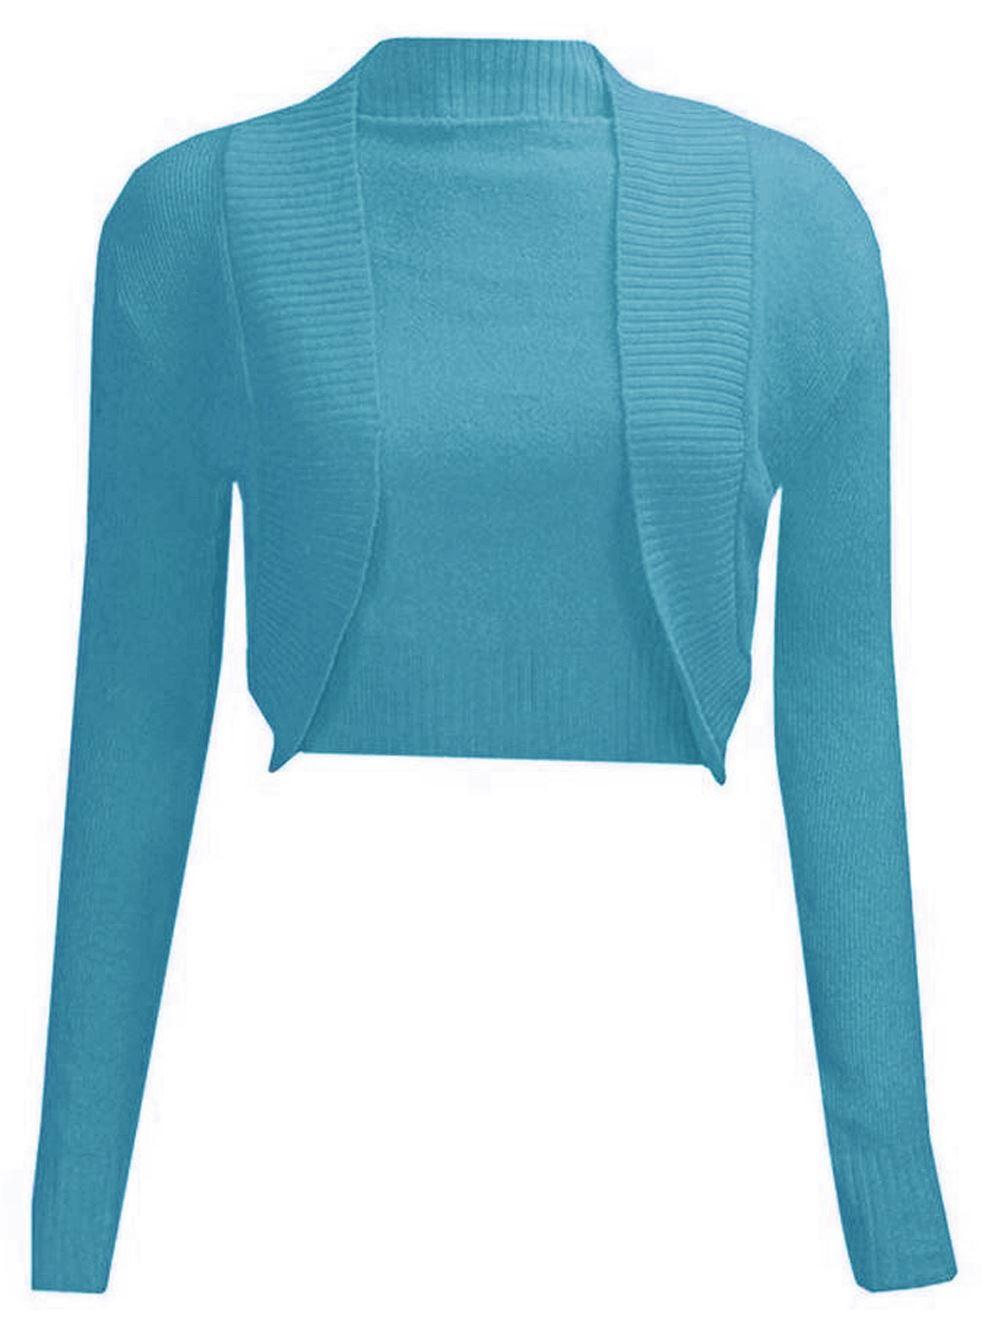 Plain Knitted Cardigan Pattern : NEW LADIES PLAIN LONG SLEEVE KNITTED BOLERO WOMENS SHRUG CARDIGAN TOP